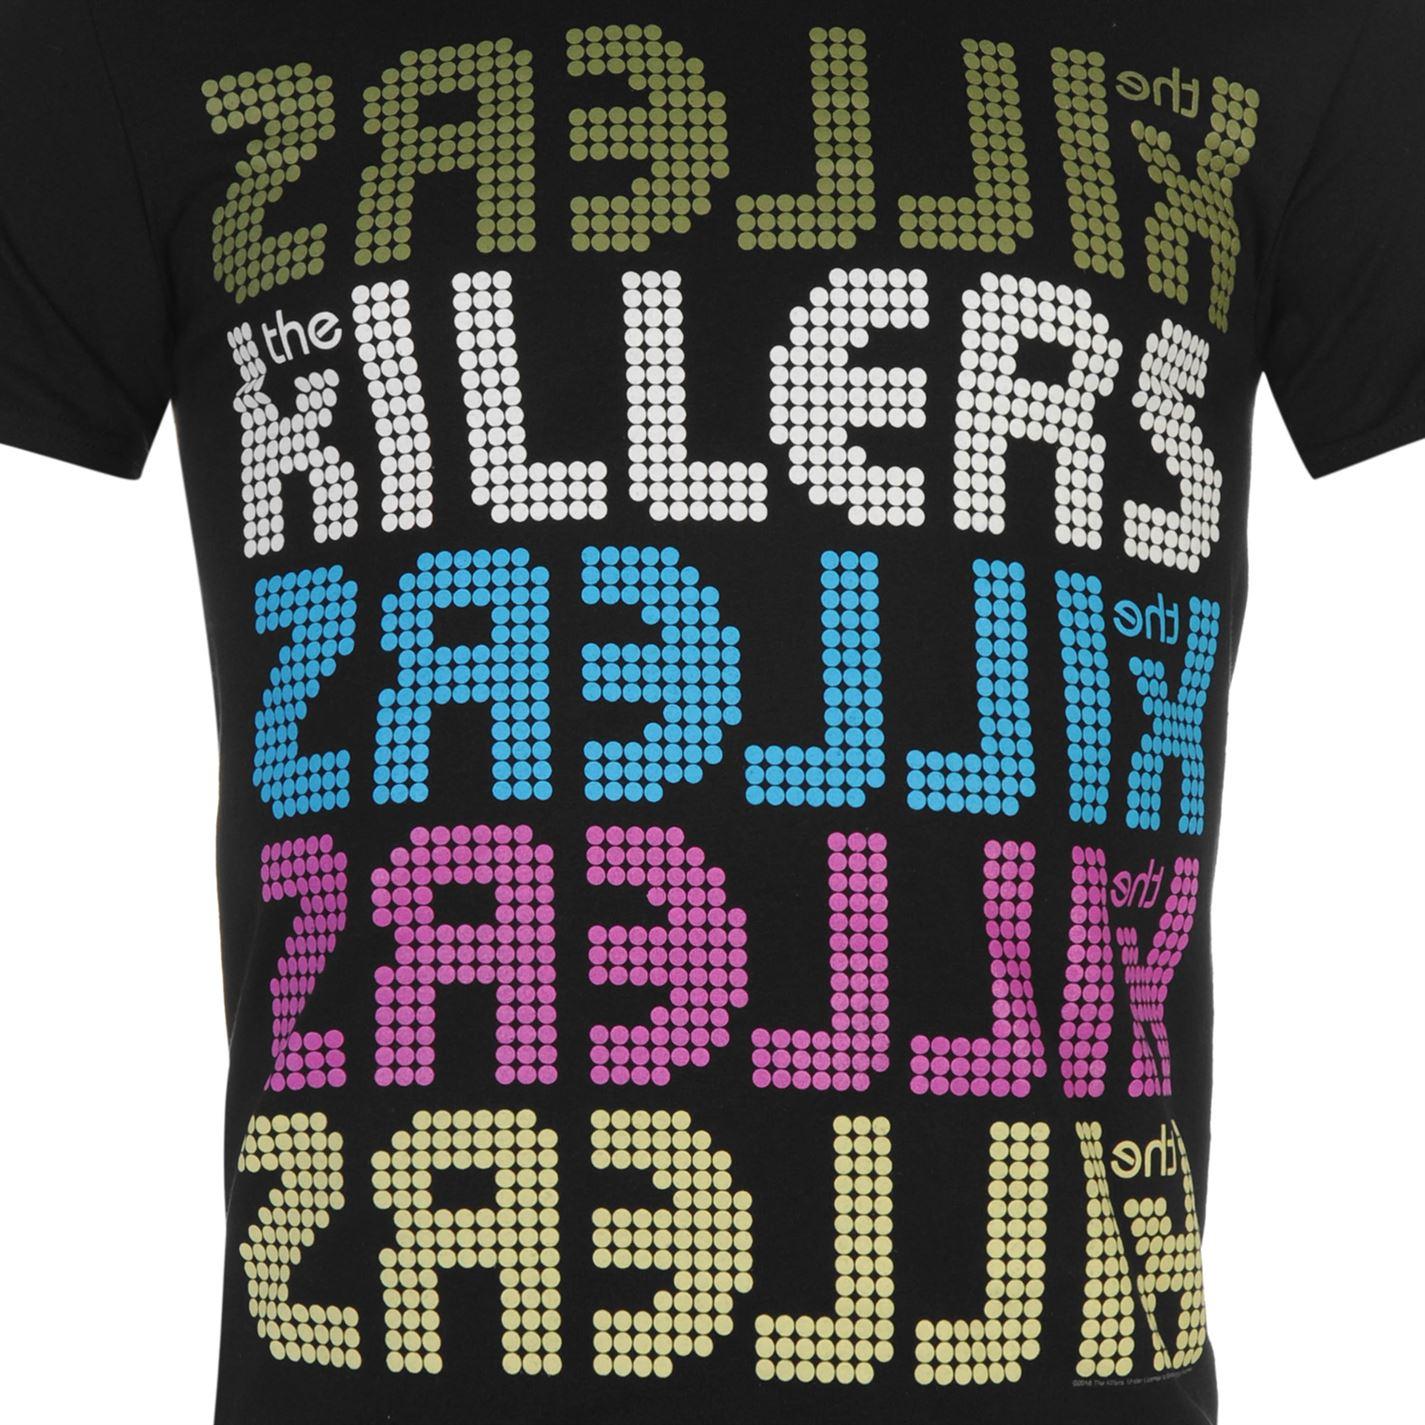 Los-asesinos-Camiseta-Oficial-Para-Hombre-Manga-Corta-Redondo-Informal-Estampado-Camiseta-Top miniatura 5